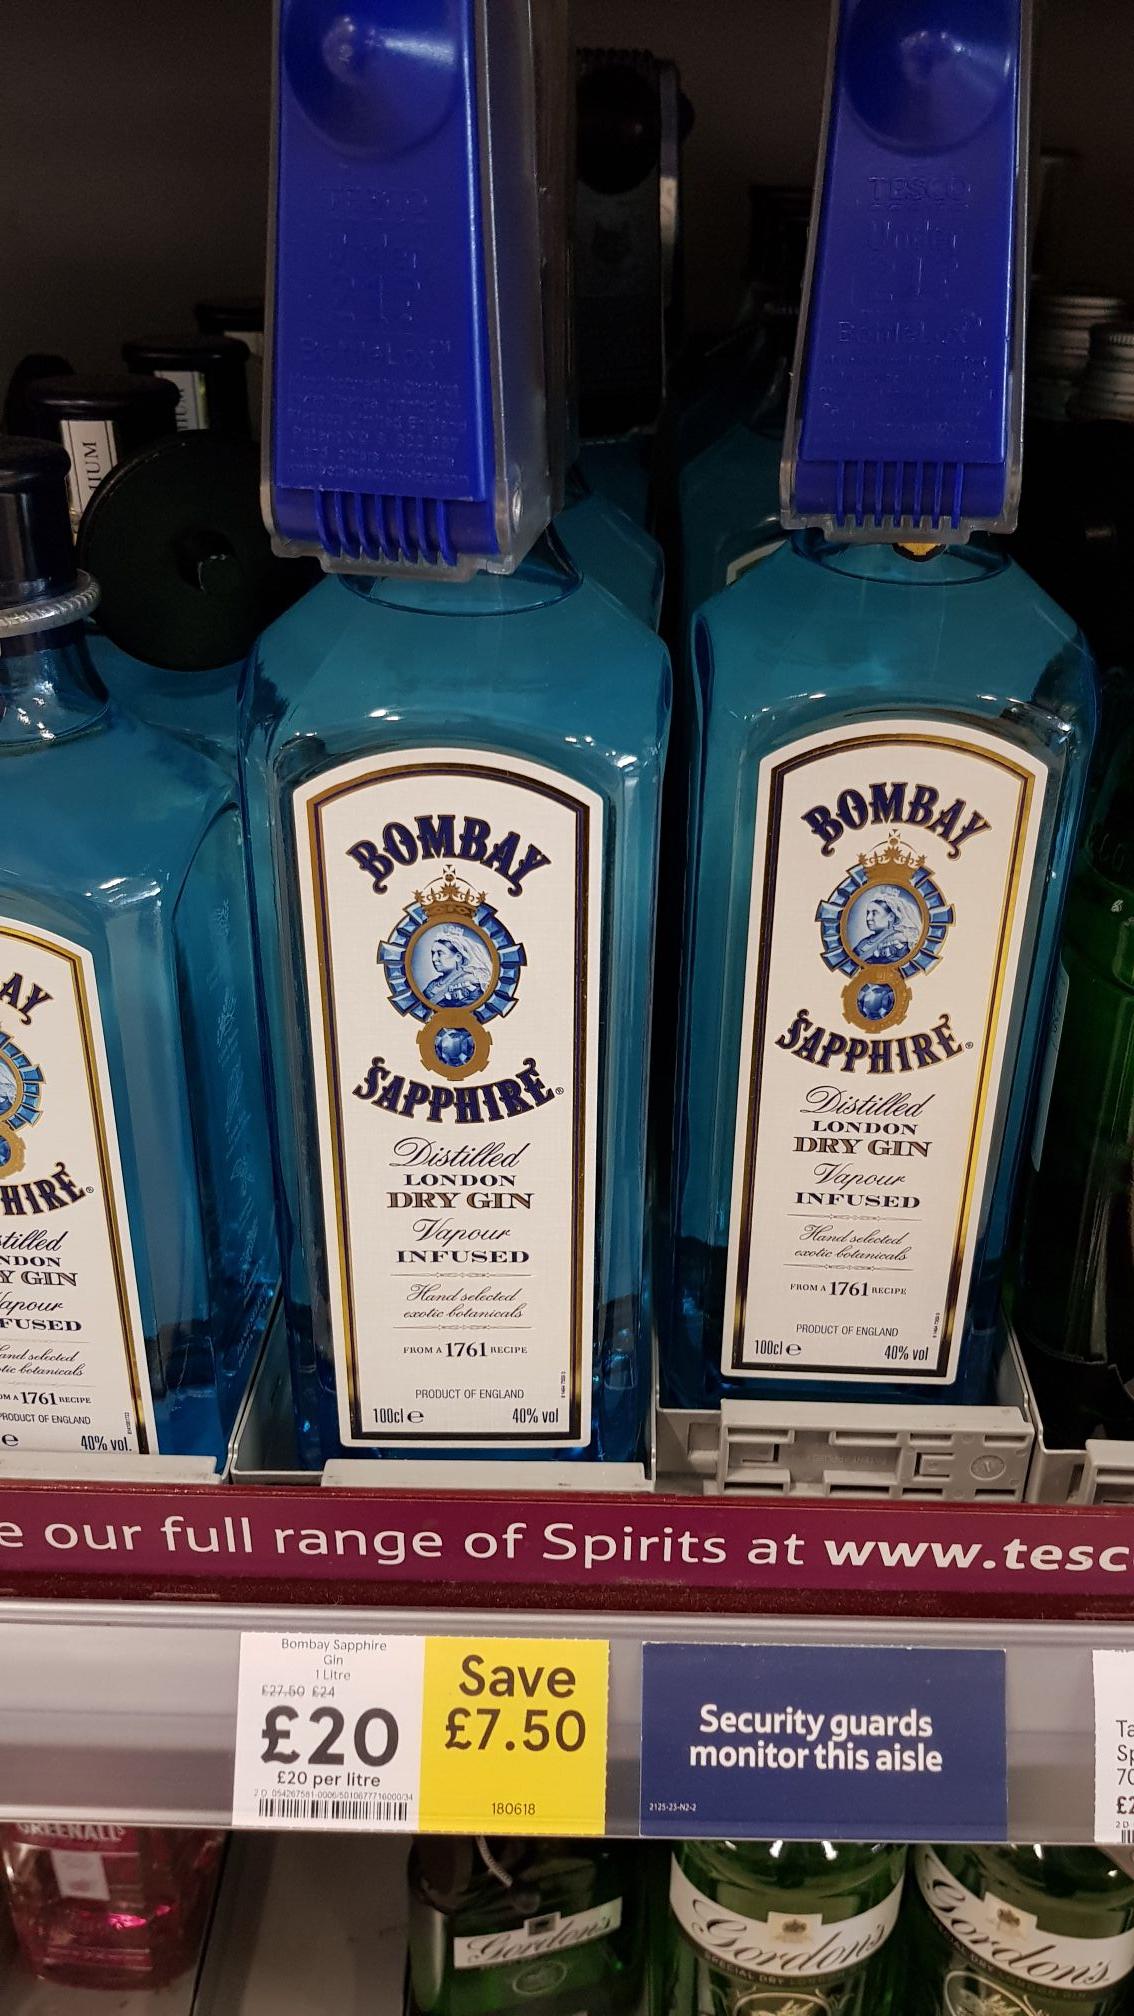 Its Back! - 1 Litre Bombay Sapphire £20 @ Tesco